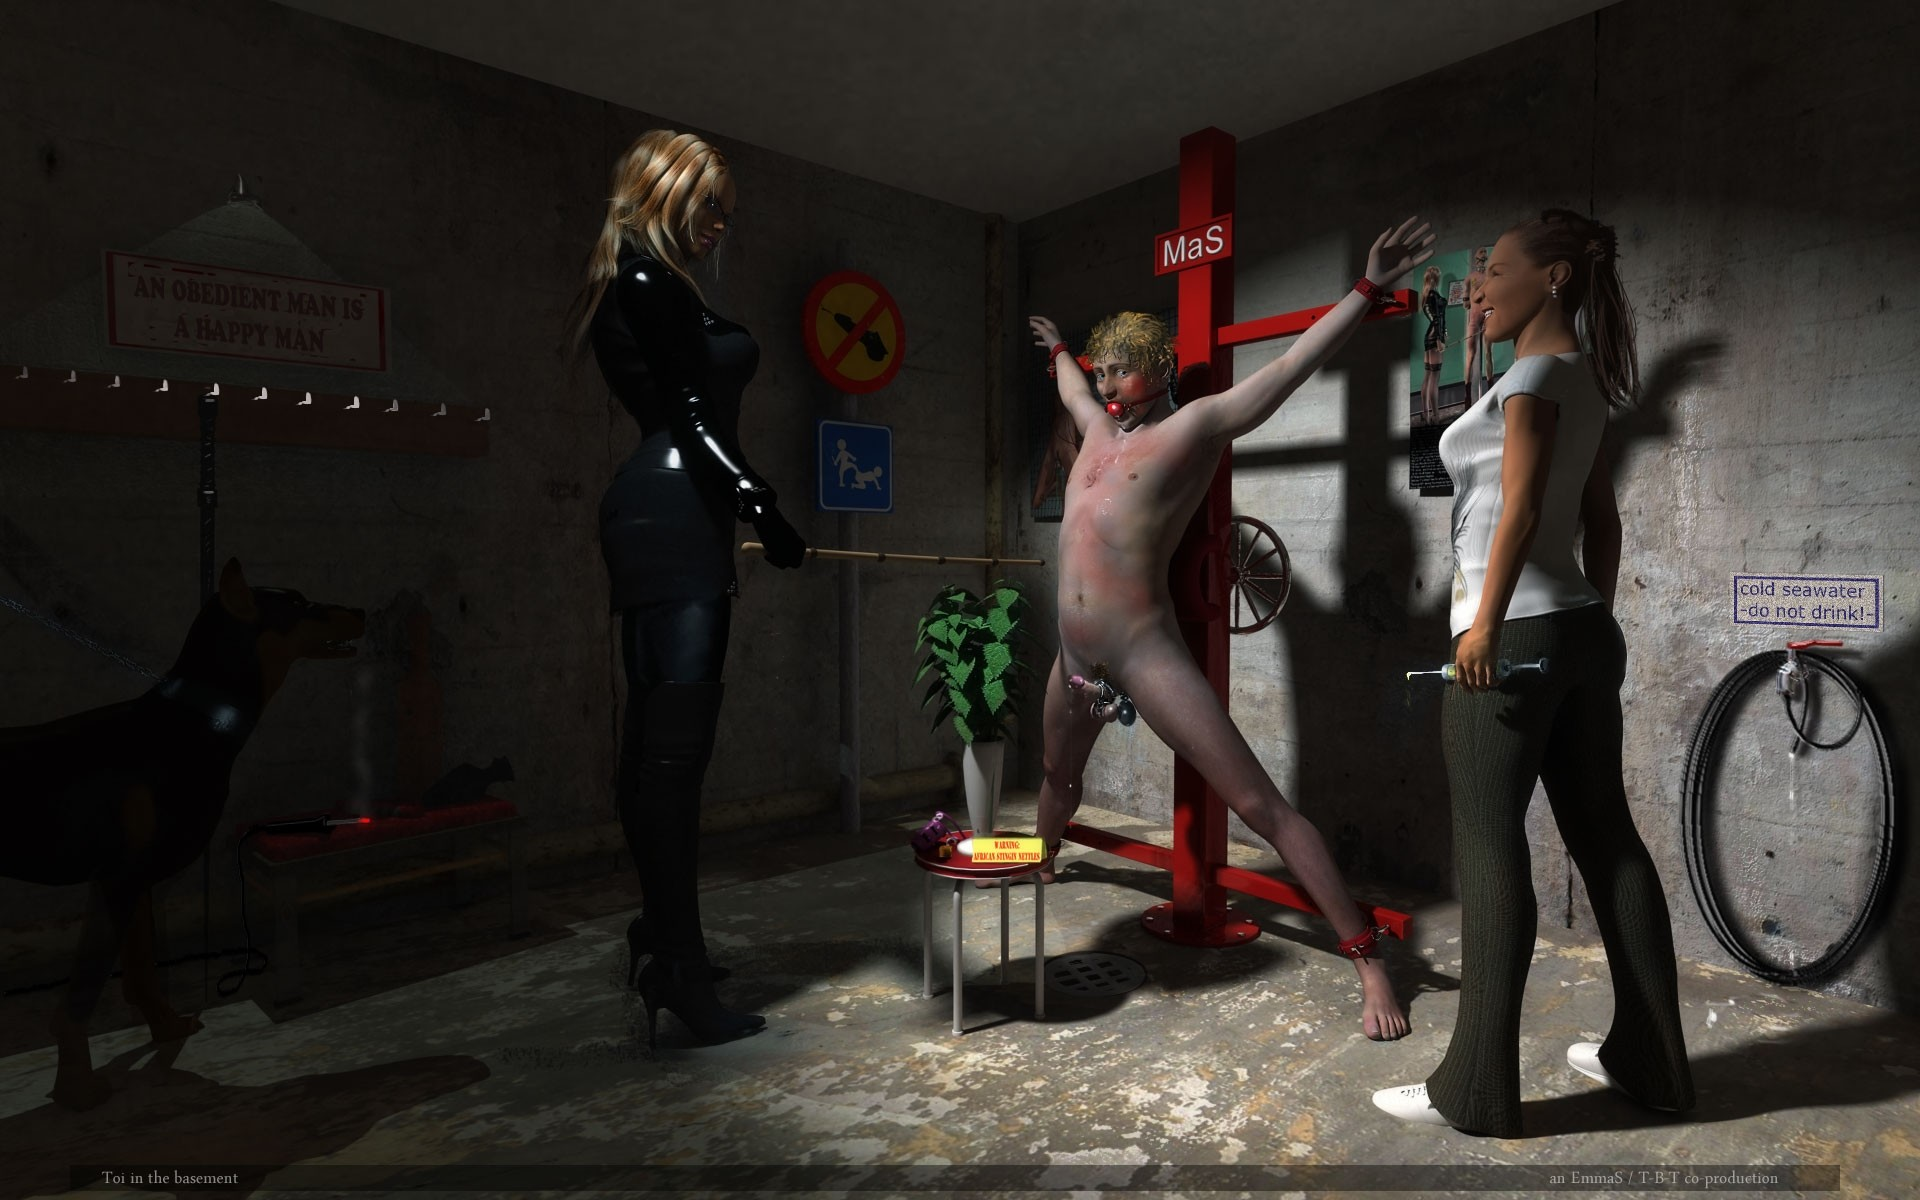 femdom art milking and castration domzine